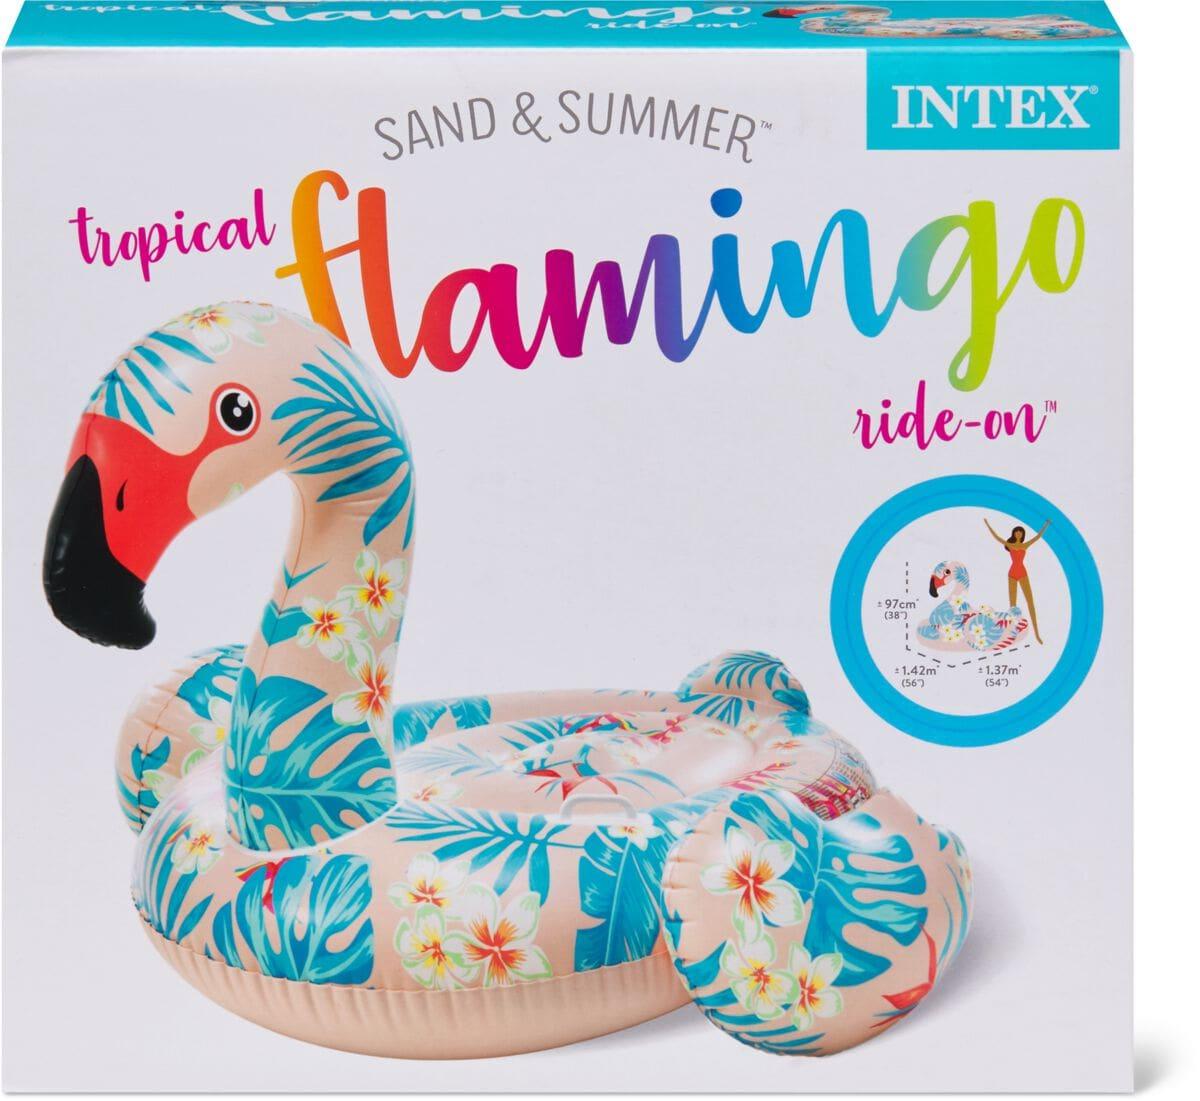 Intex Tropical Flamingo Ride on Materassini ad aria